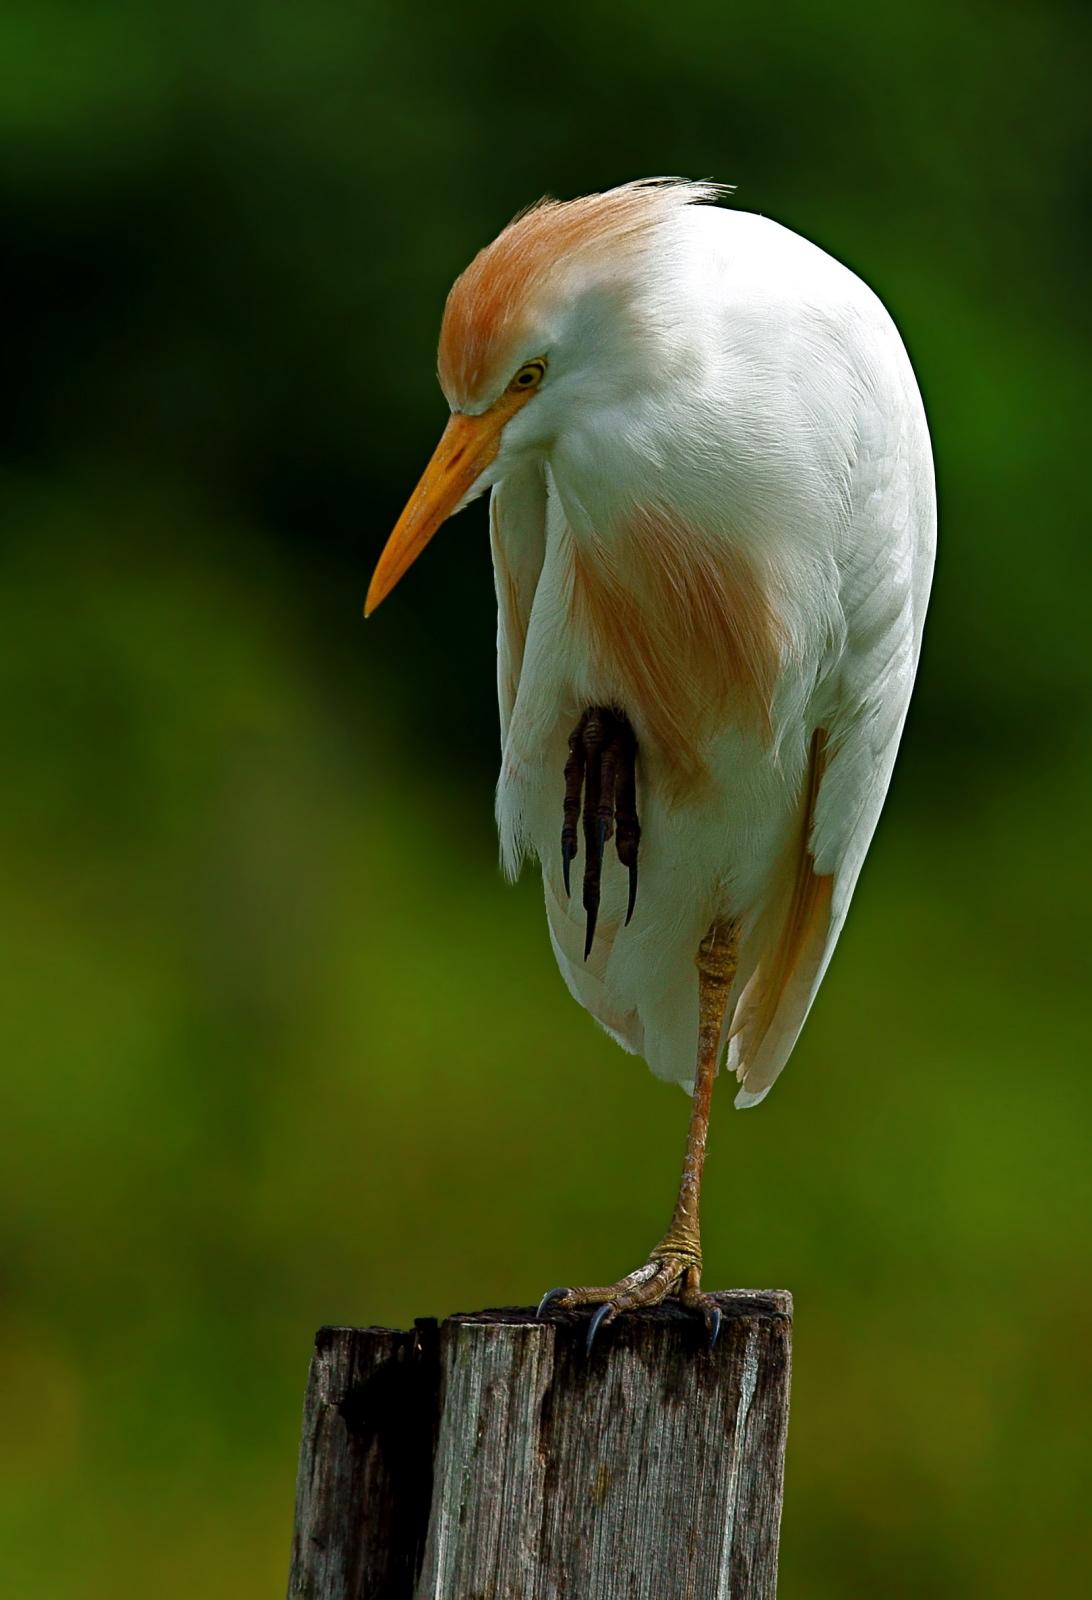 Heron garde-boeufs_MichelGiraud-Audine